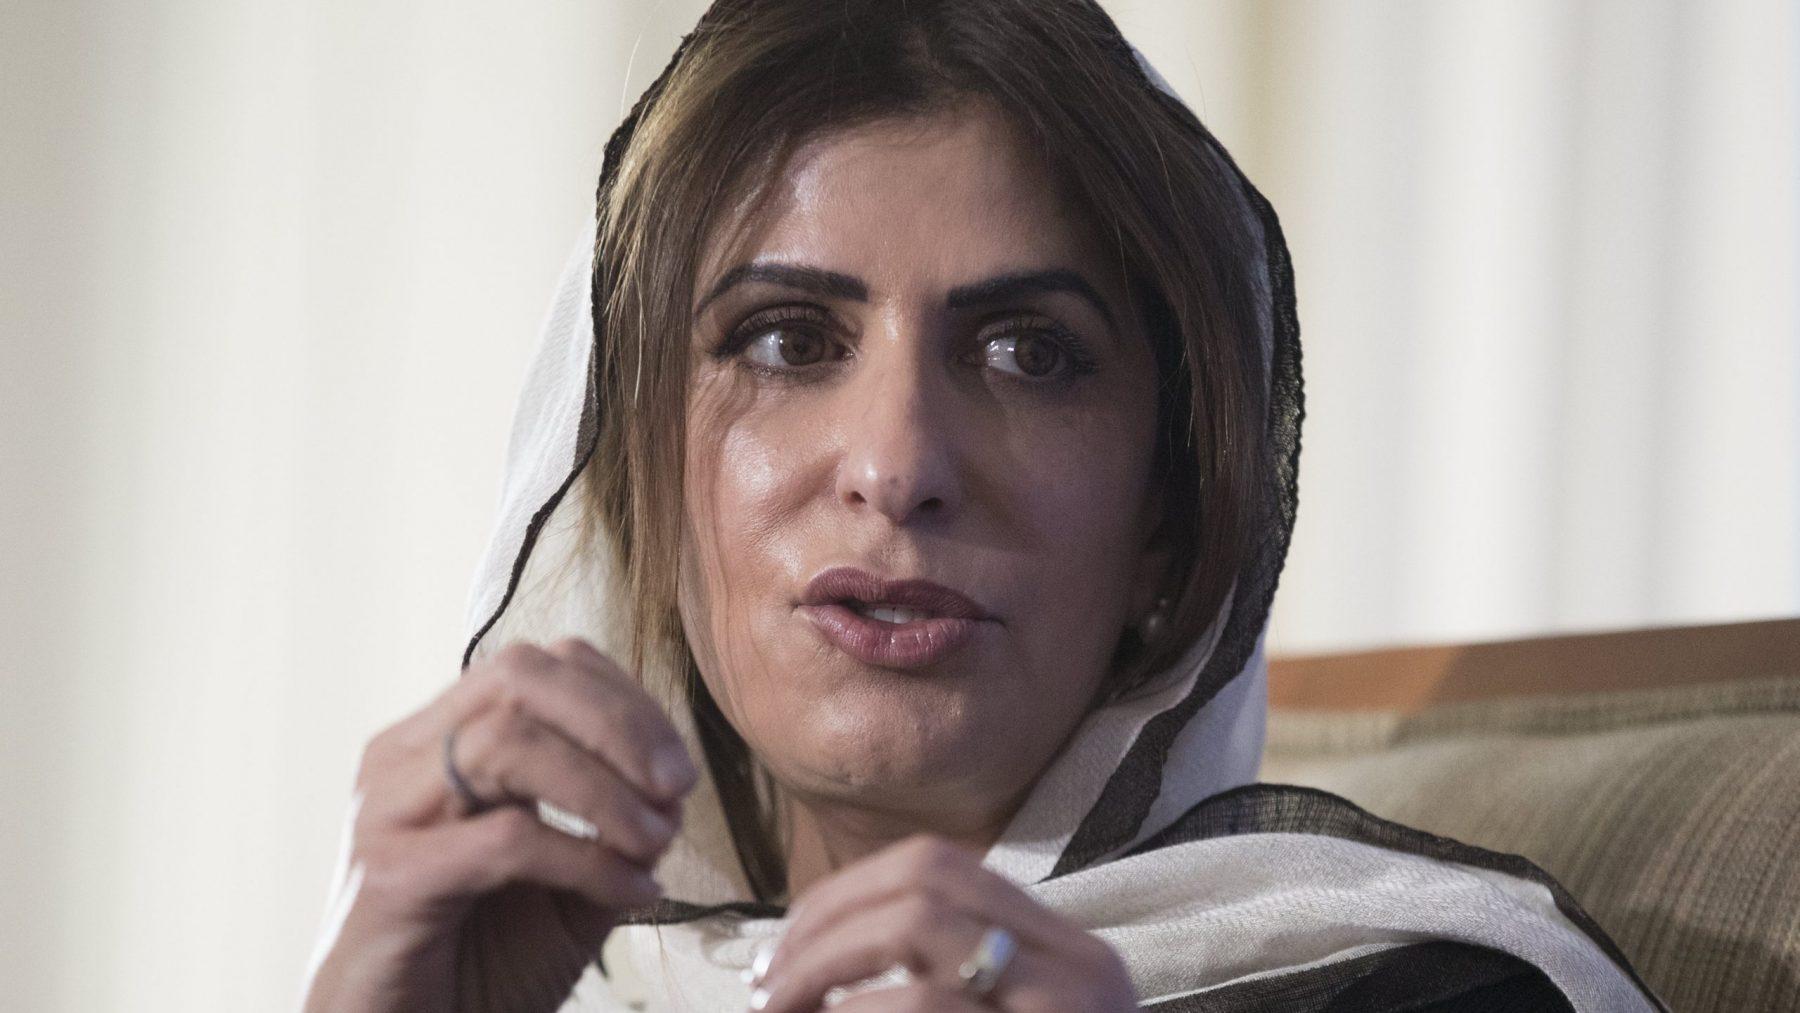 Basmah Bint Saud vraagt in brief om vrijlating gevangenis